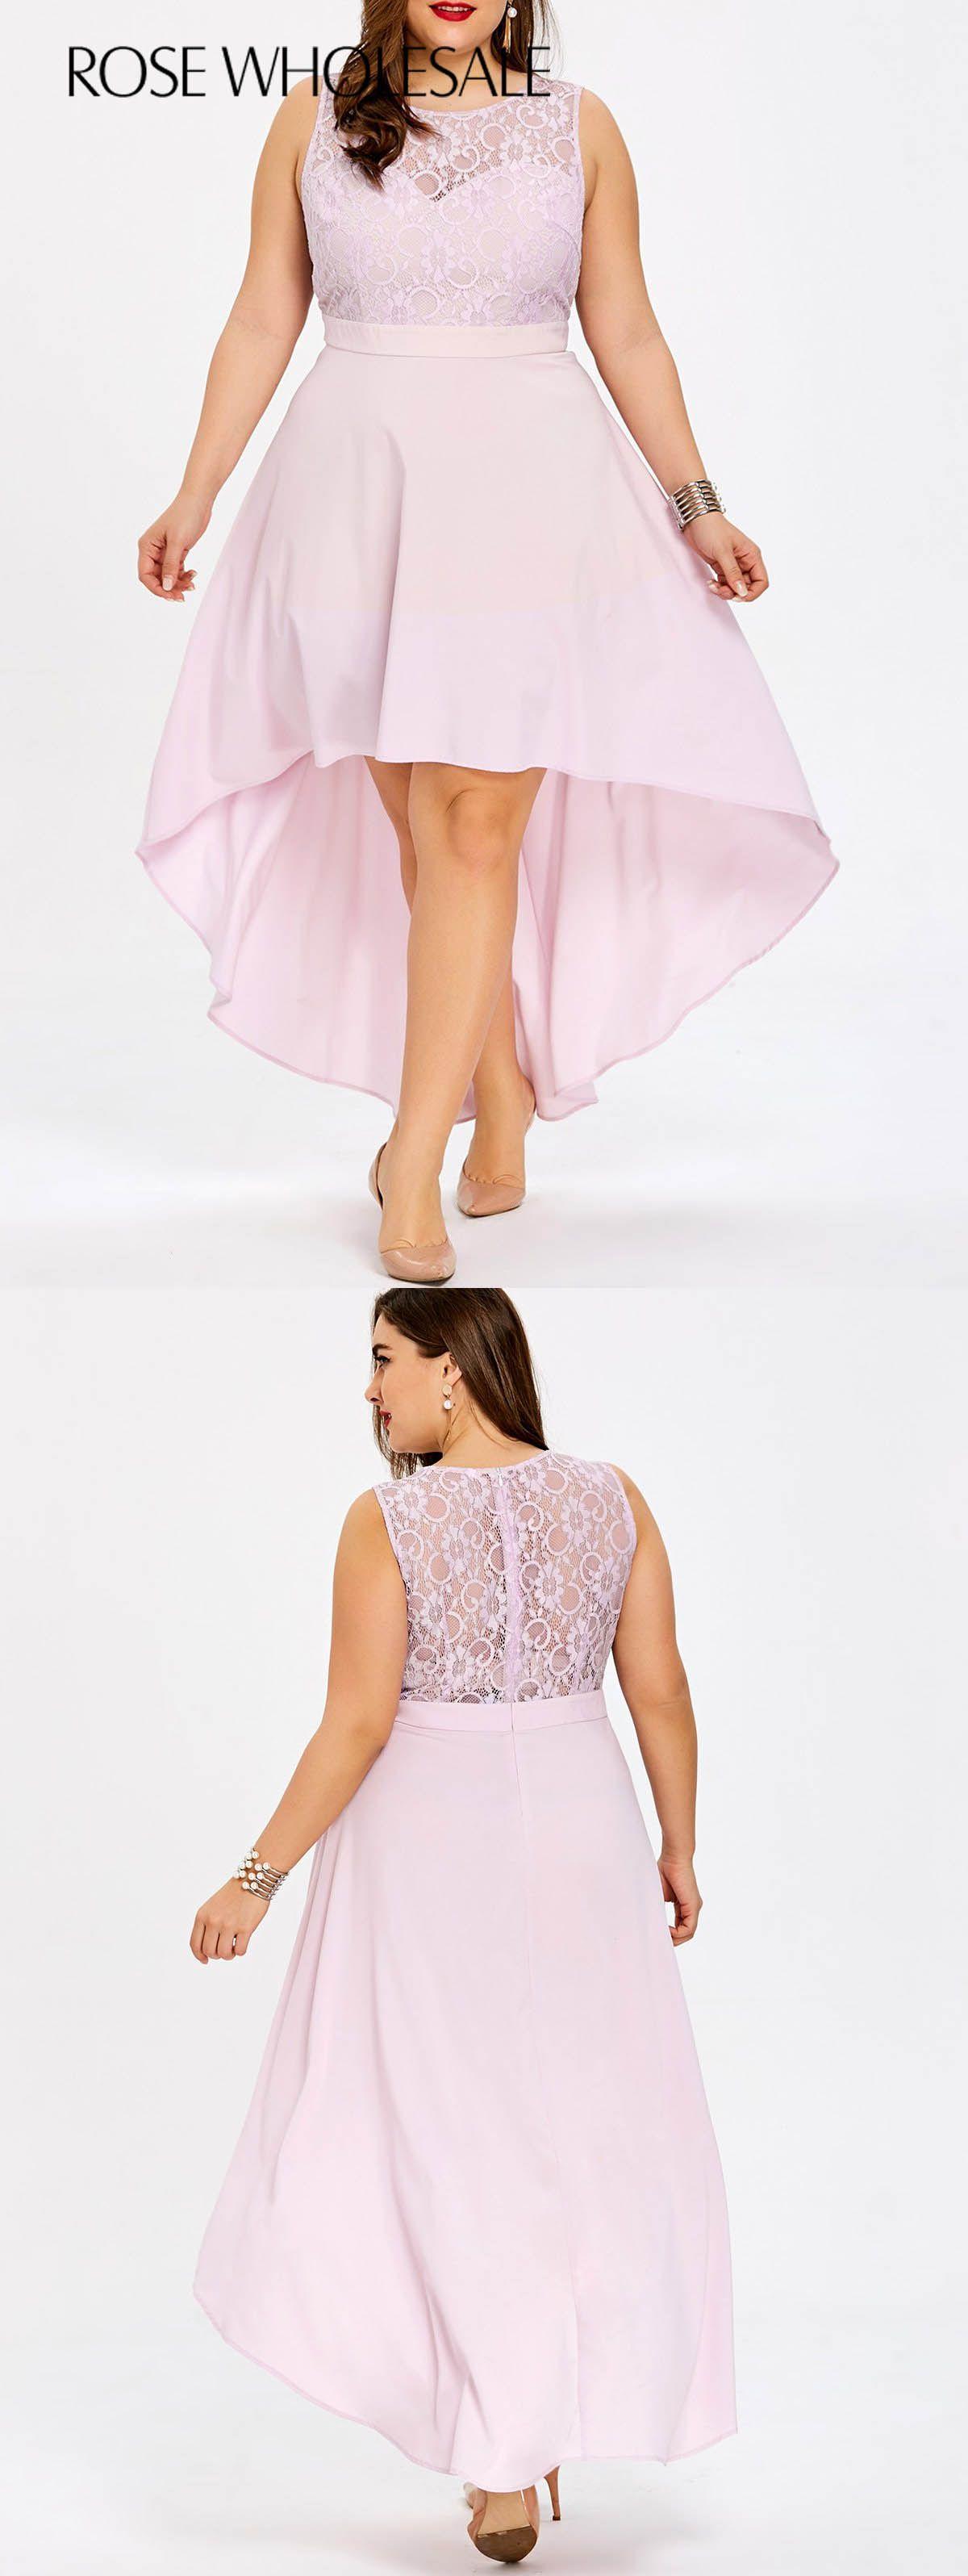 14 71 Plus Size Sleeveless High Low Hem Bridesmaid Dress Light Pink 3xl Rosewholesale Curvy Bridesmaid Dresses Trendy Dresses Summer Summer Dress Outfits [ 3192 x 1200 Pixel ]